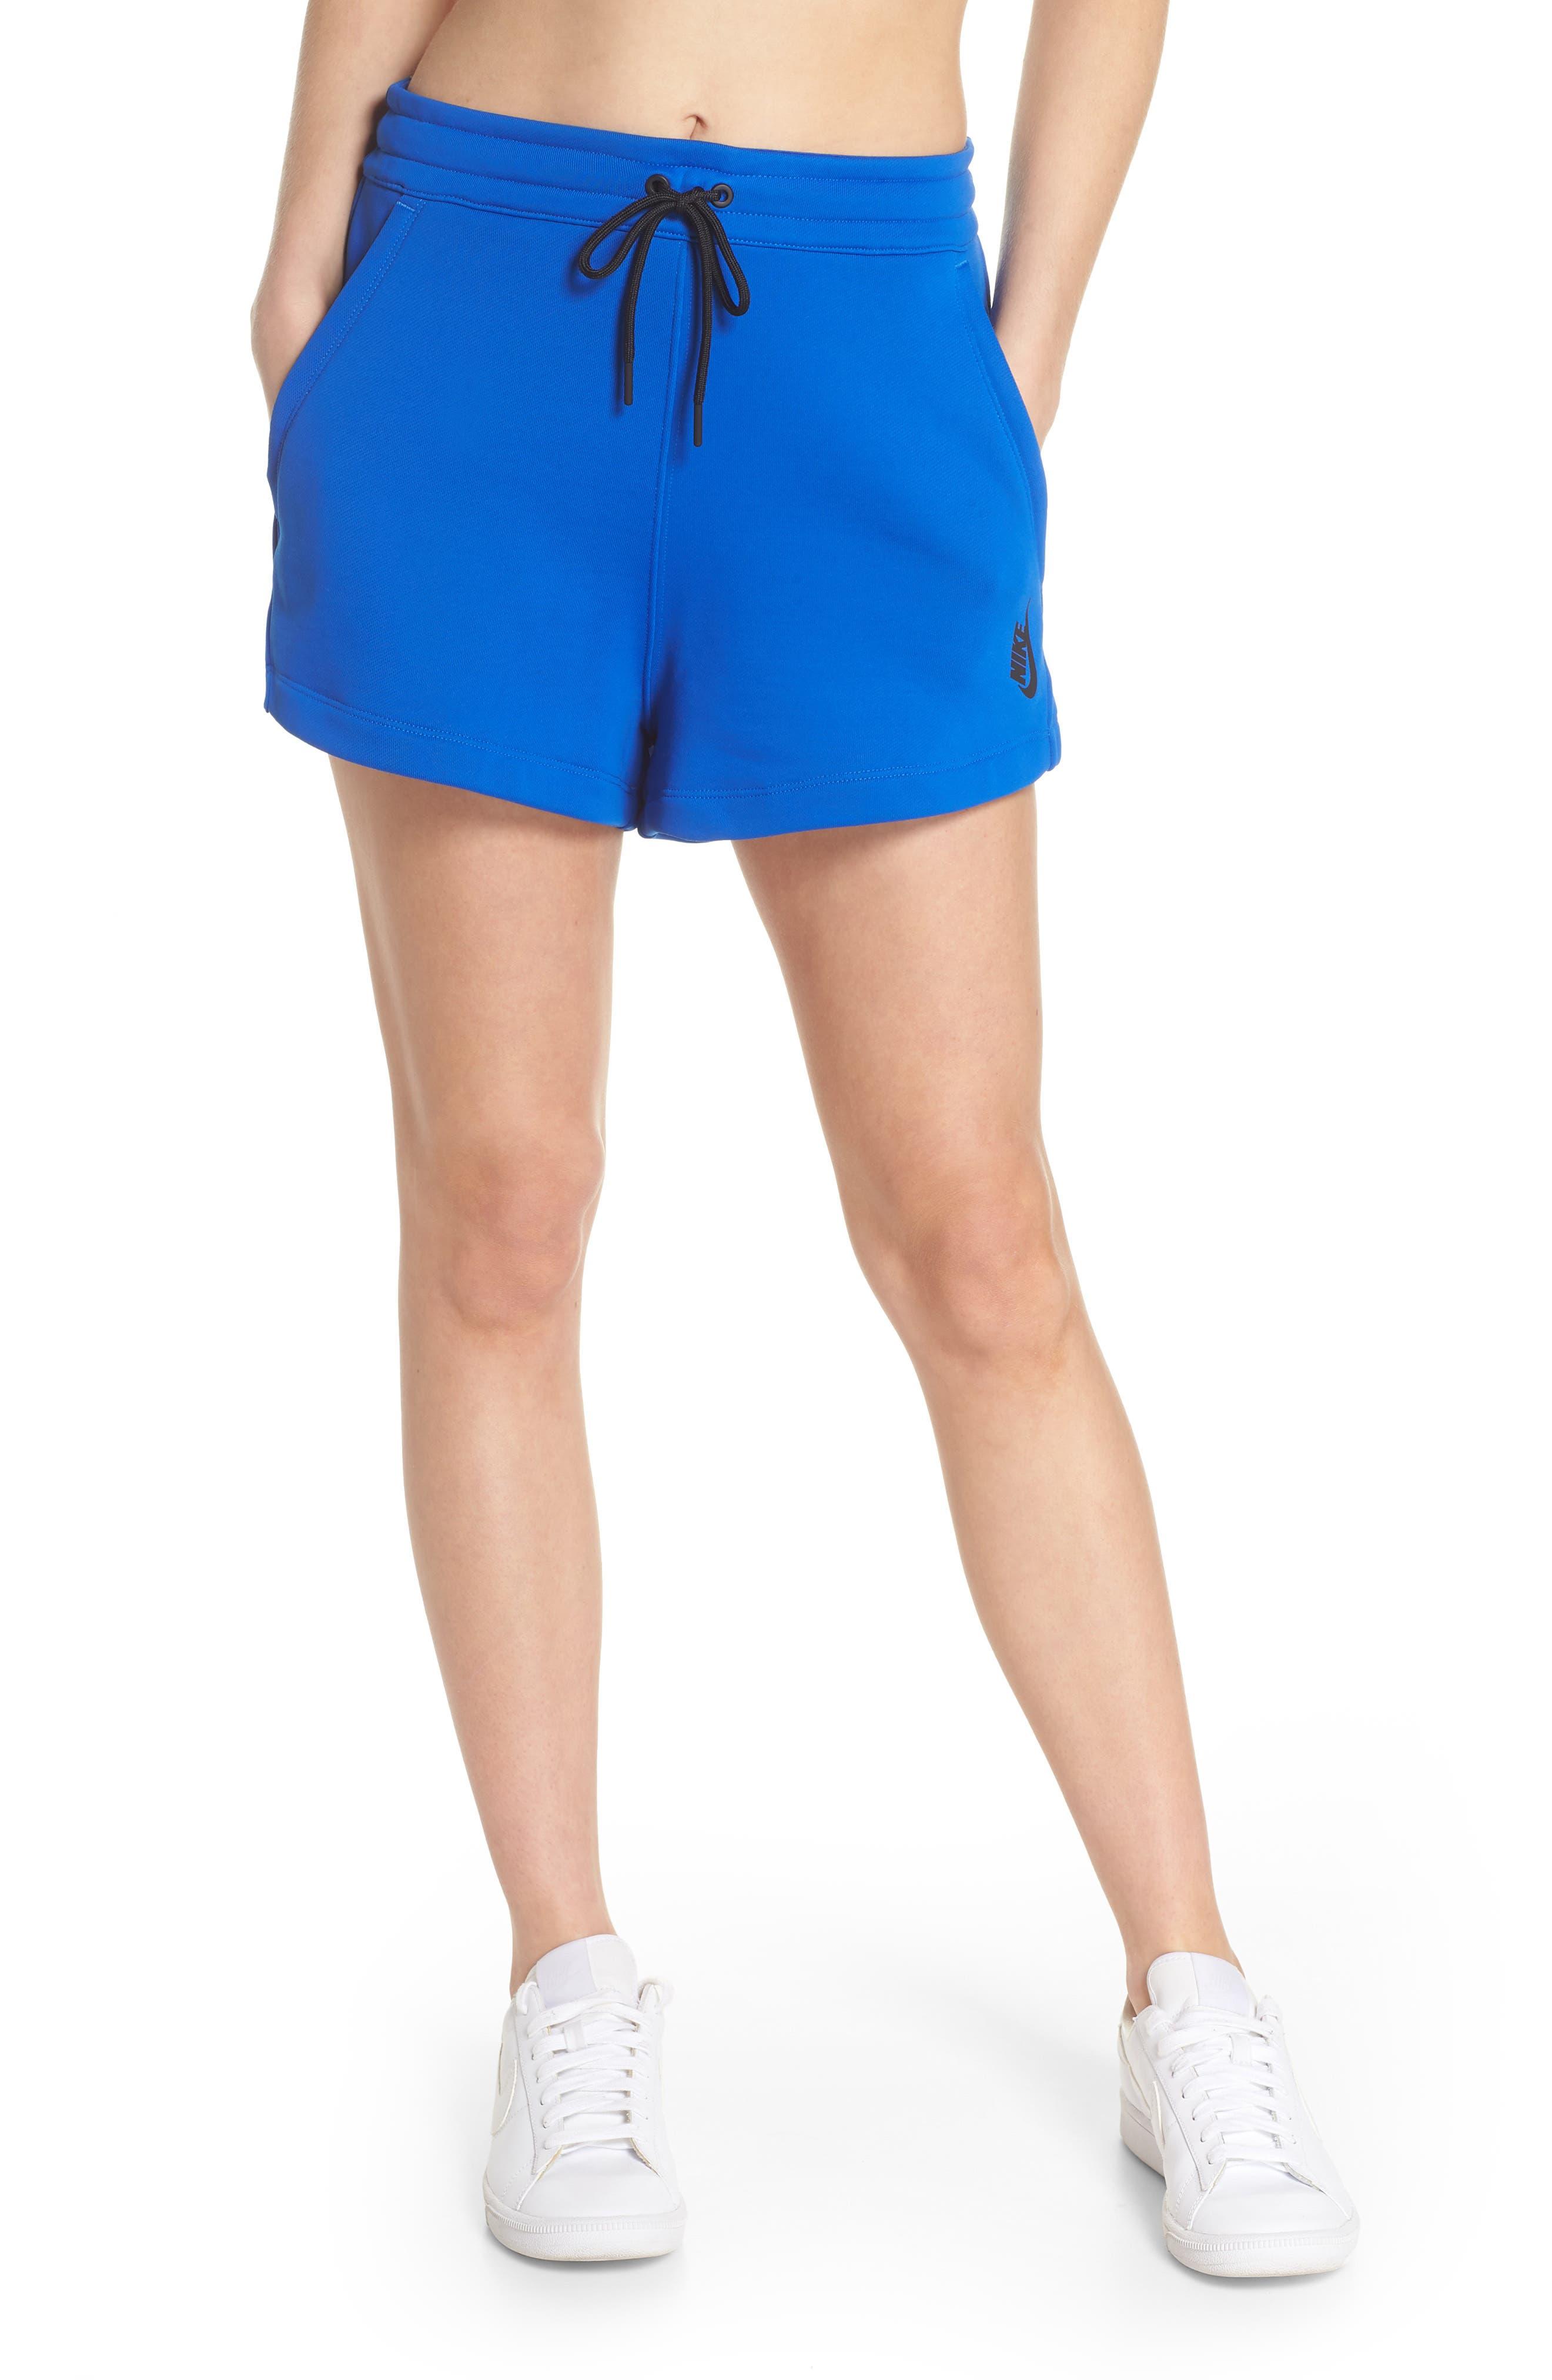 NikeLab Collection Women's Fleece Shorts,                         Main,                         color, Hyper Cobalt/ Black